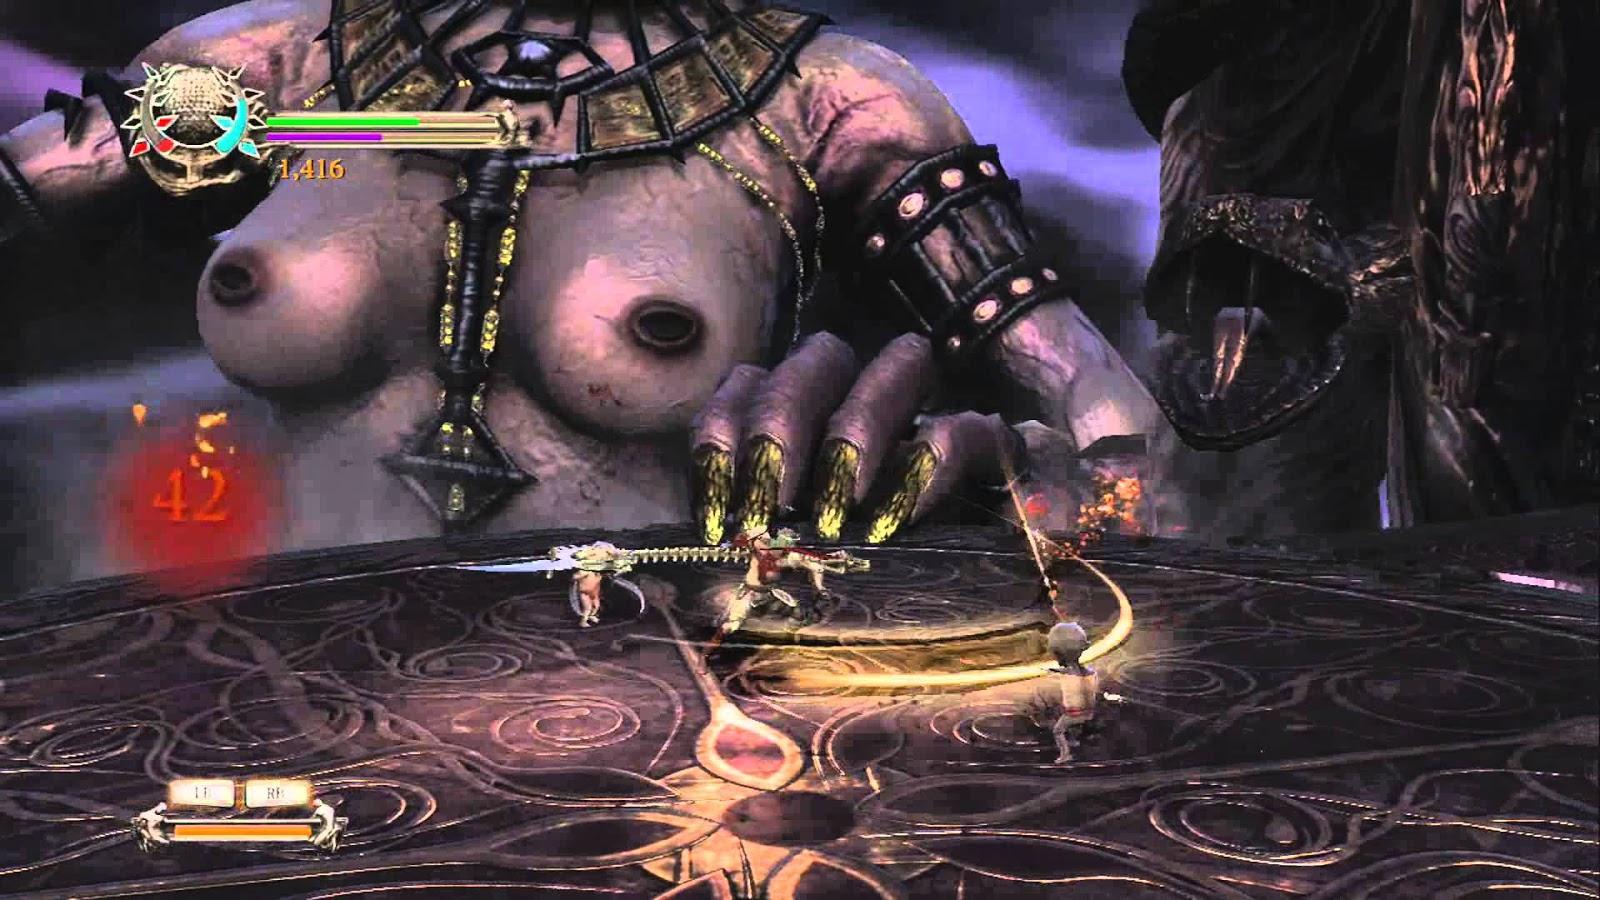 Dantes inferno wife naked — photo 12